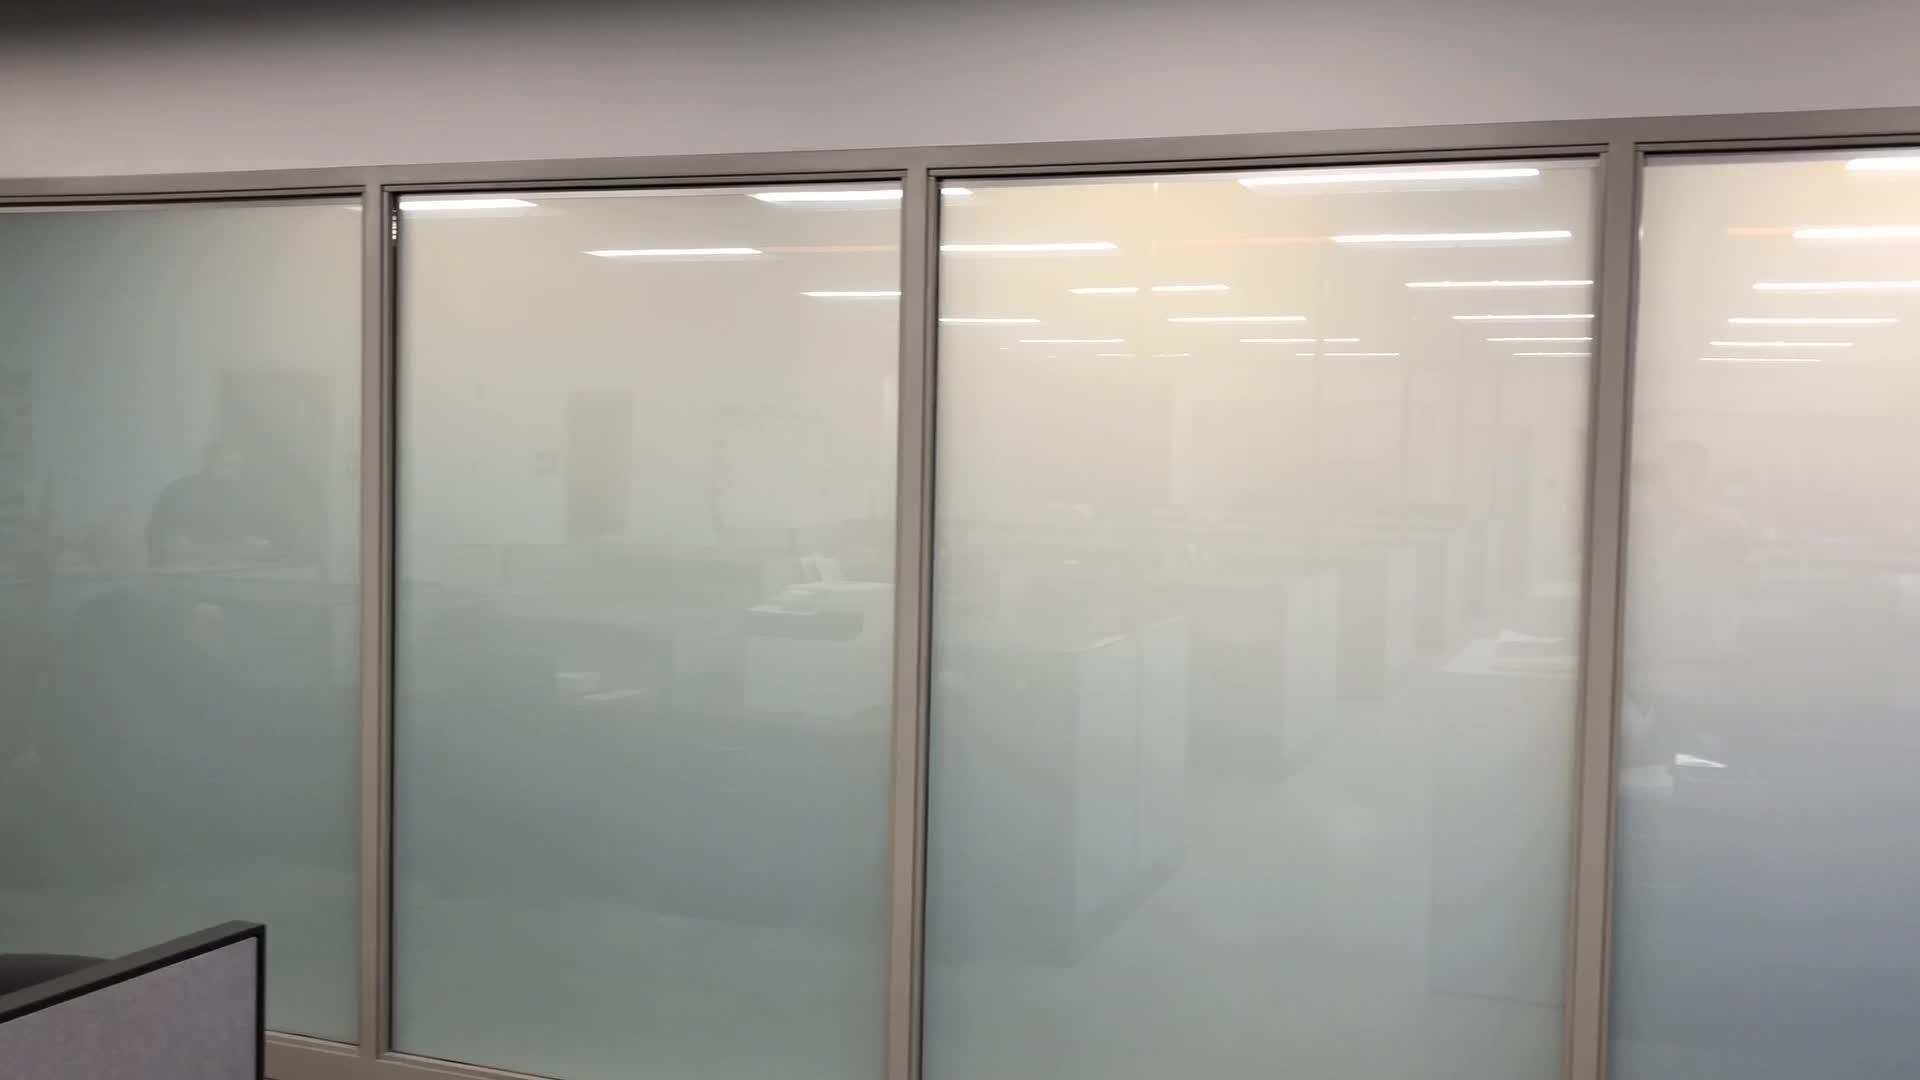 Self adhesive filme PDLC vidro inteligente